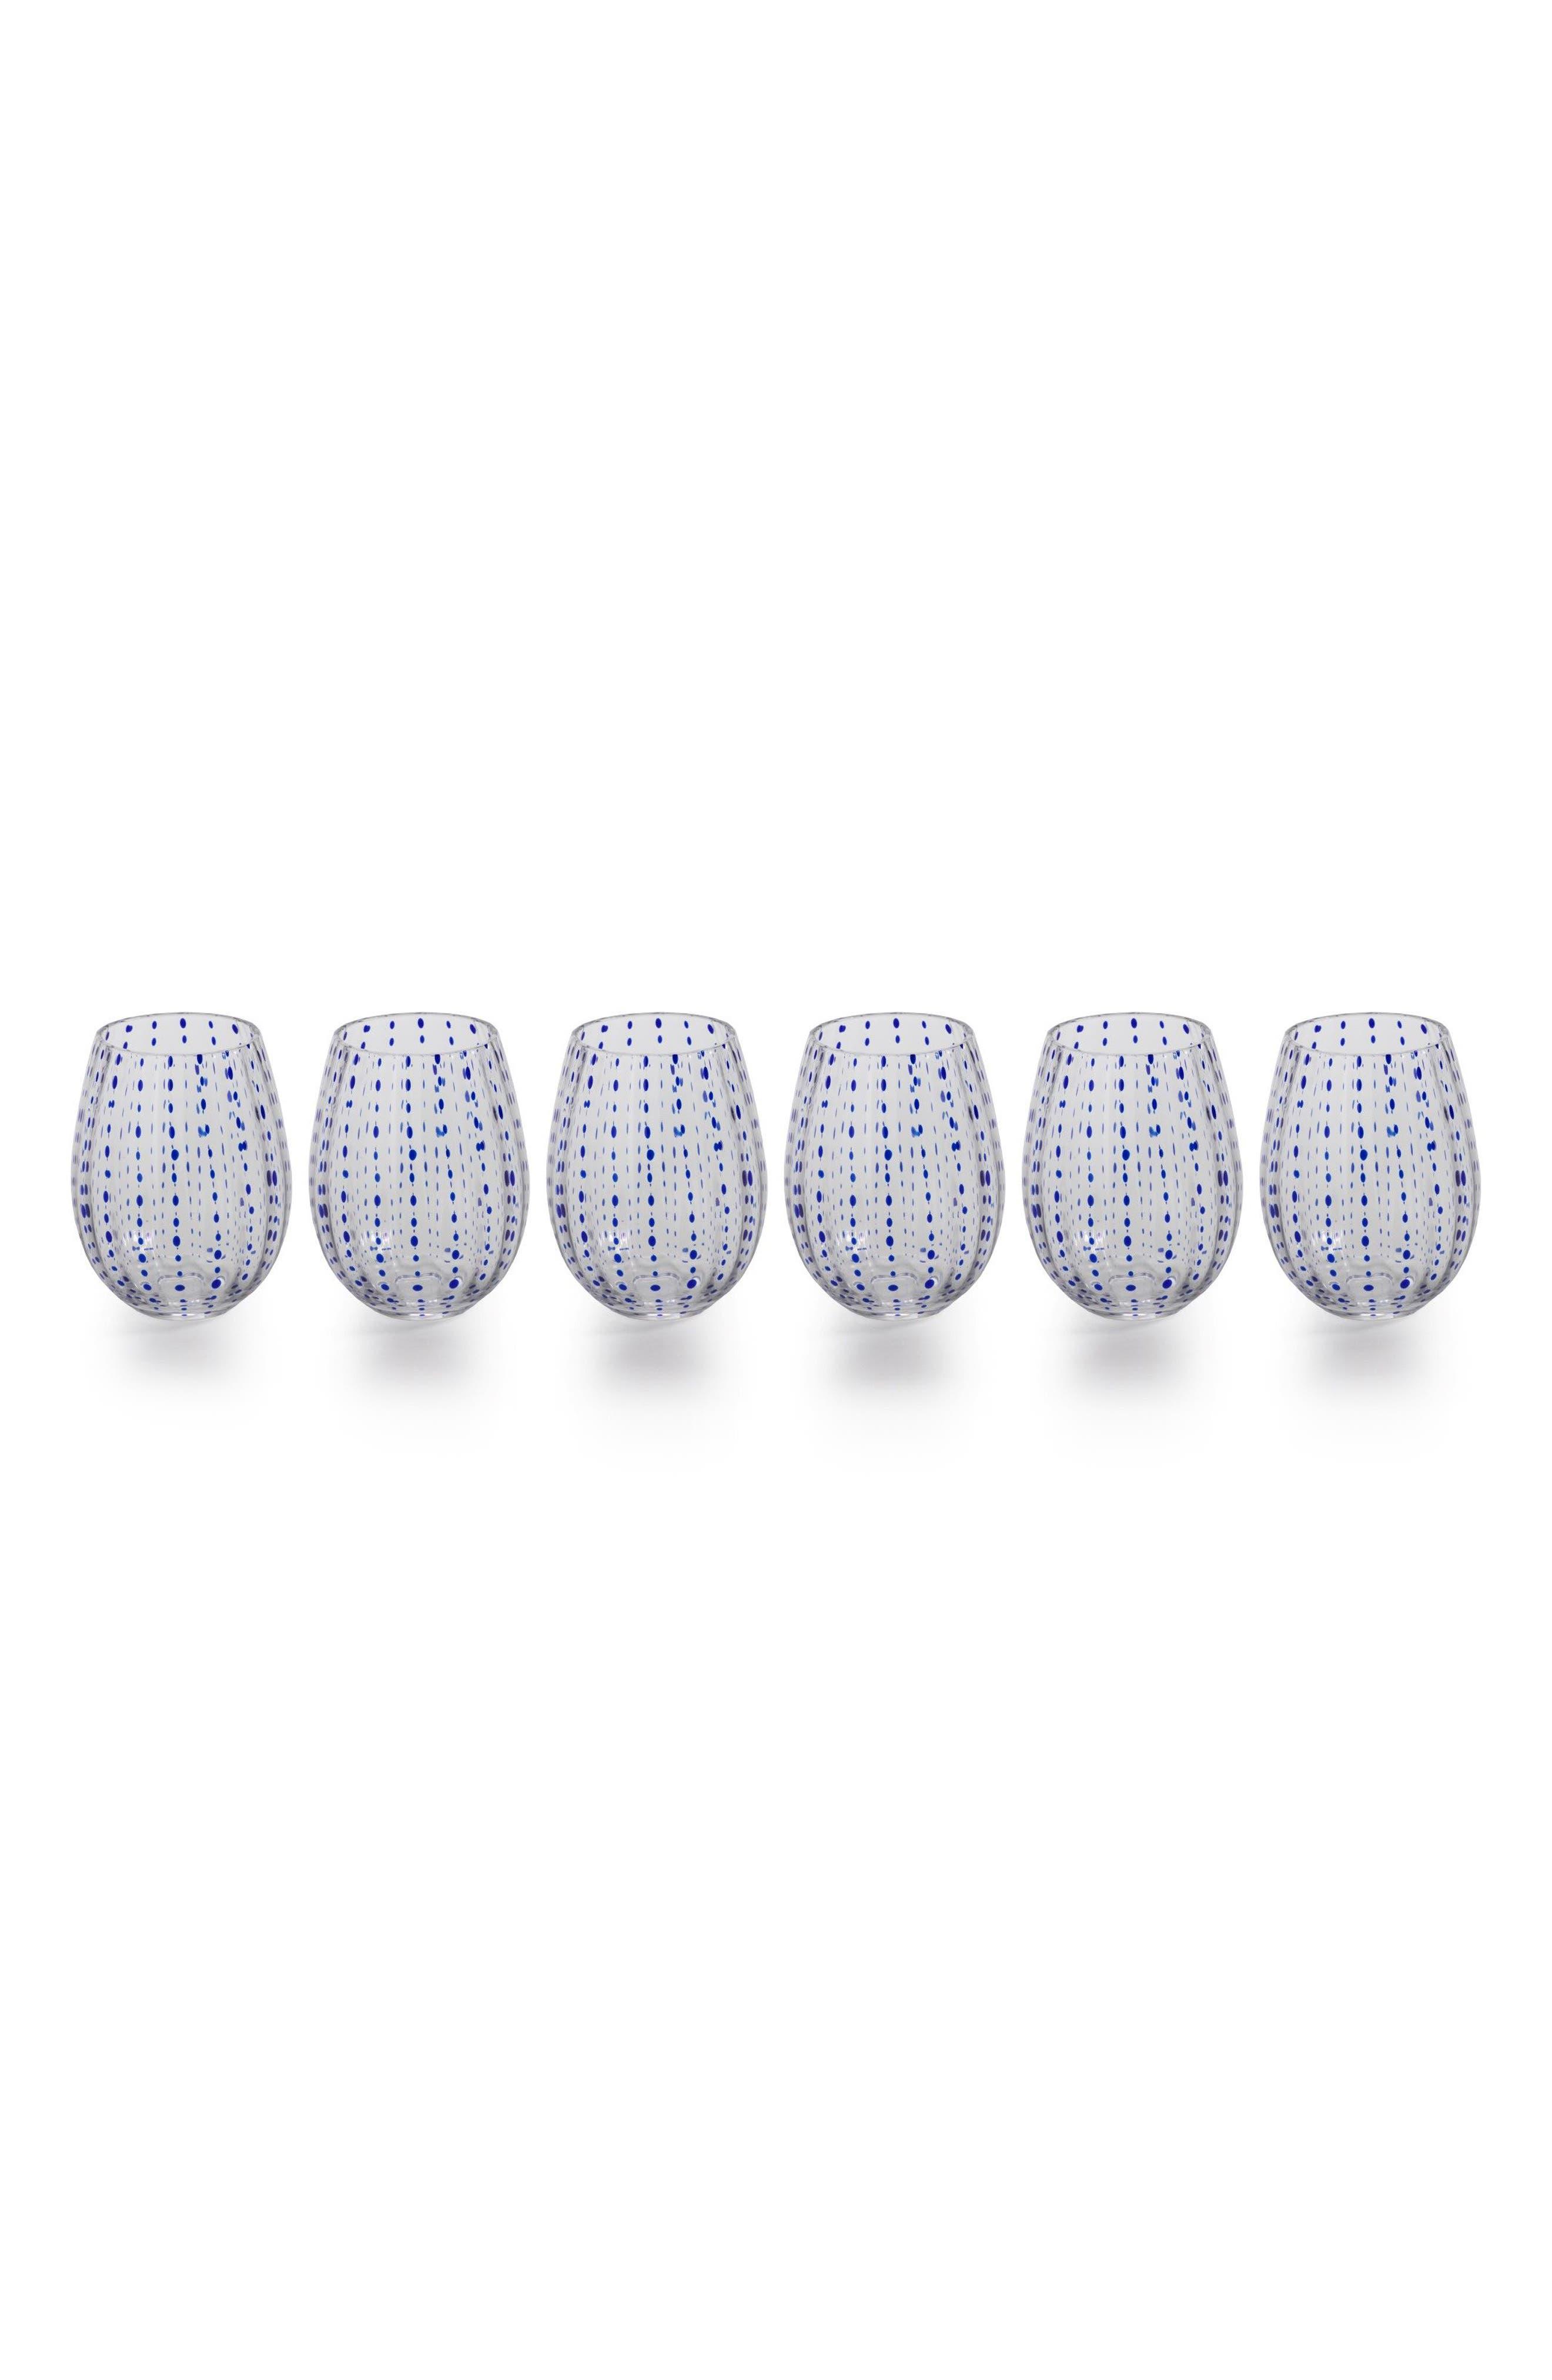 Alternate Image 1 Selected - Zodax Mavi Set of 6 Stemless Wine Glasses